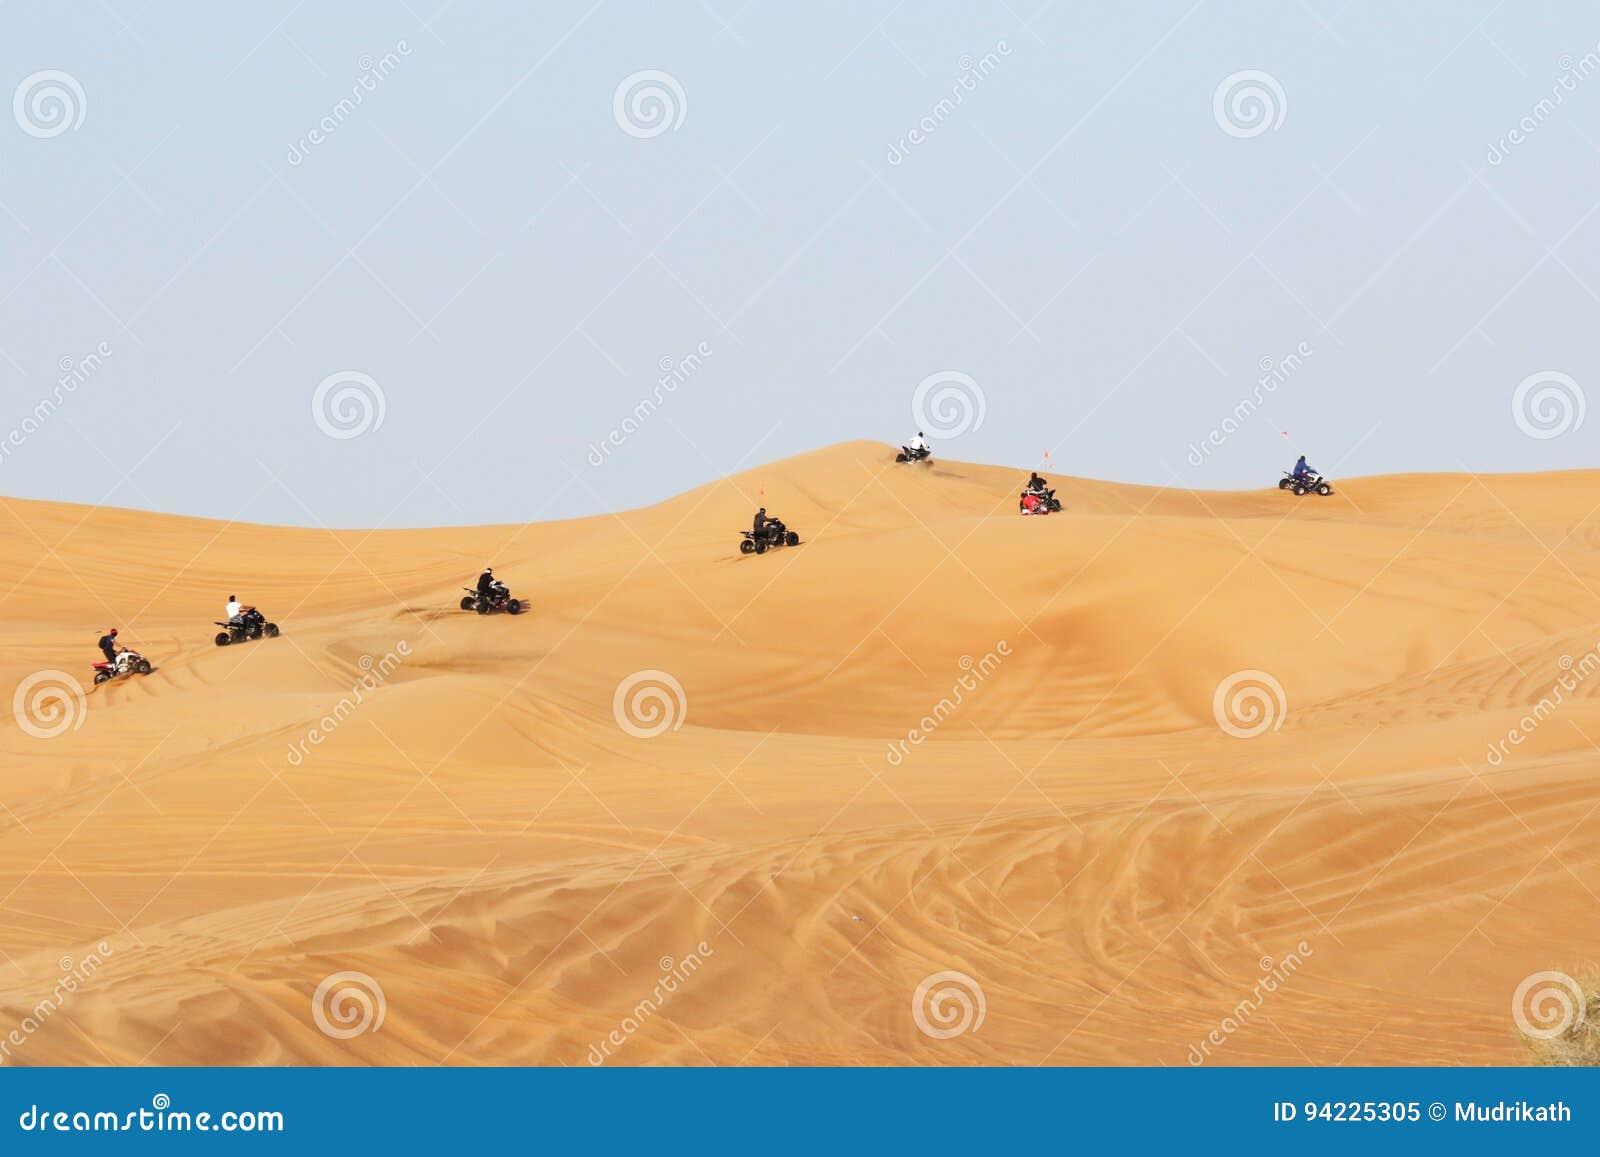 Bike Riding in Dubai Desert Safari